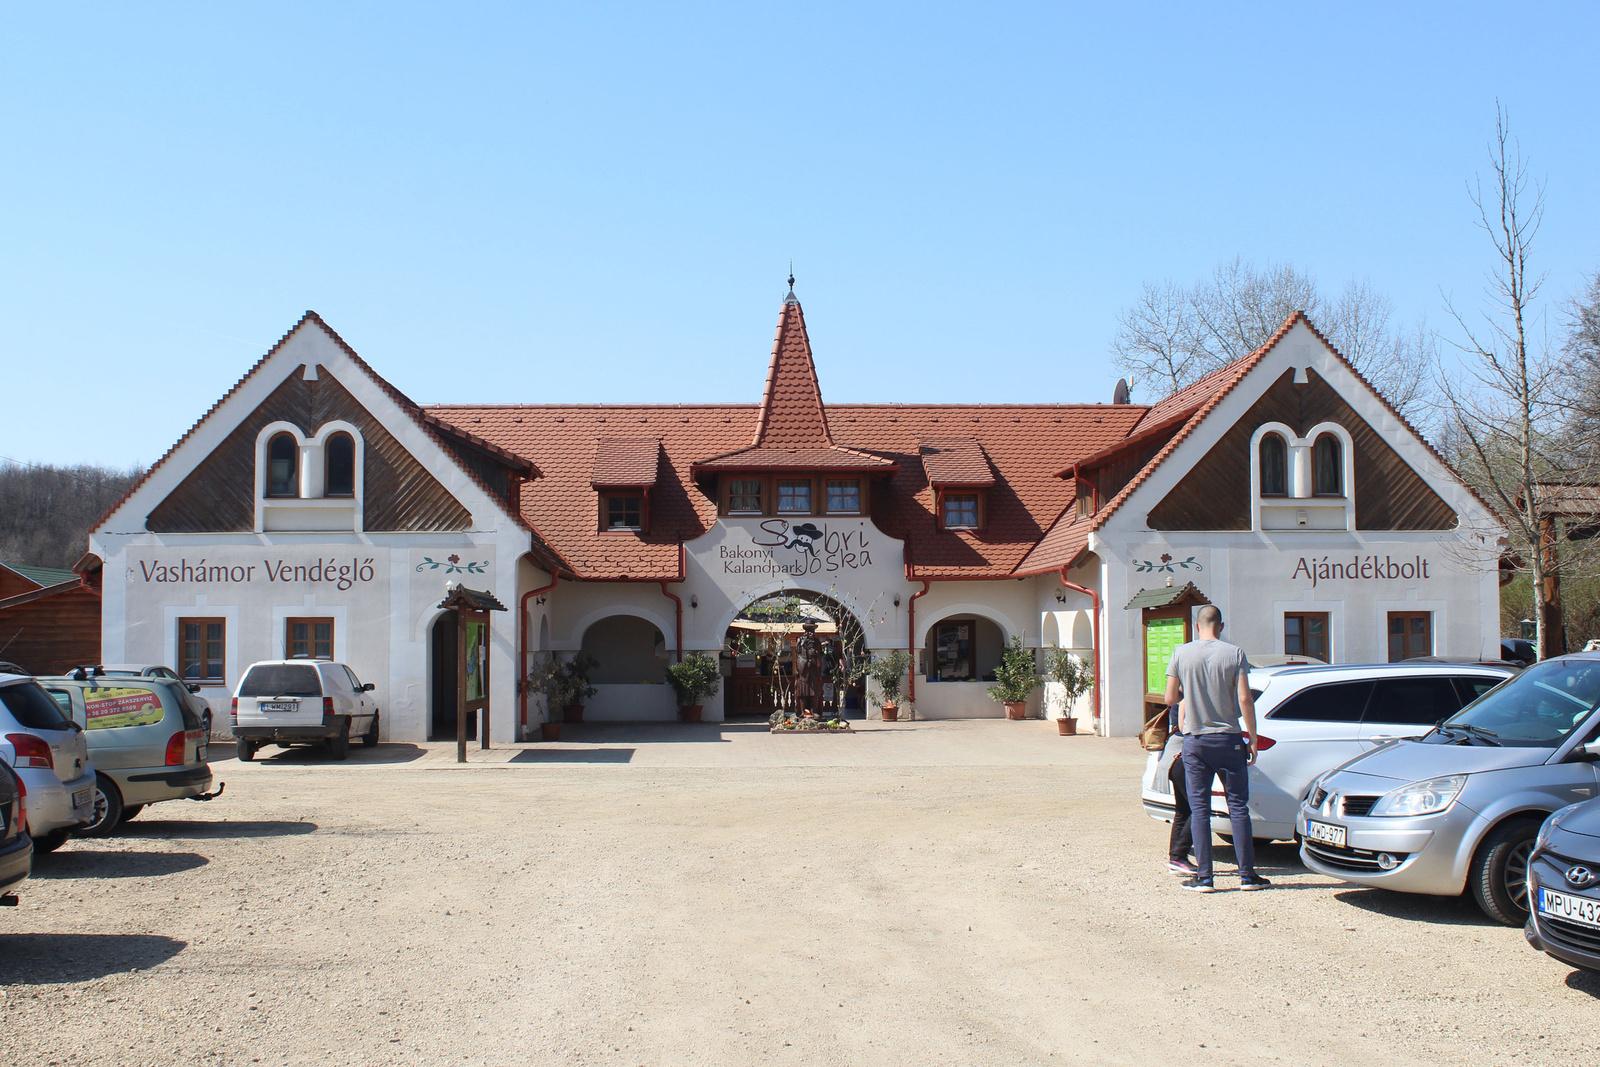 20170402-48-SobriJoskaKalandpark